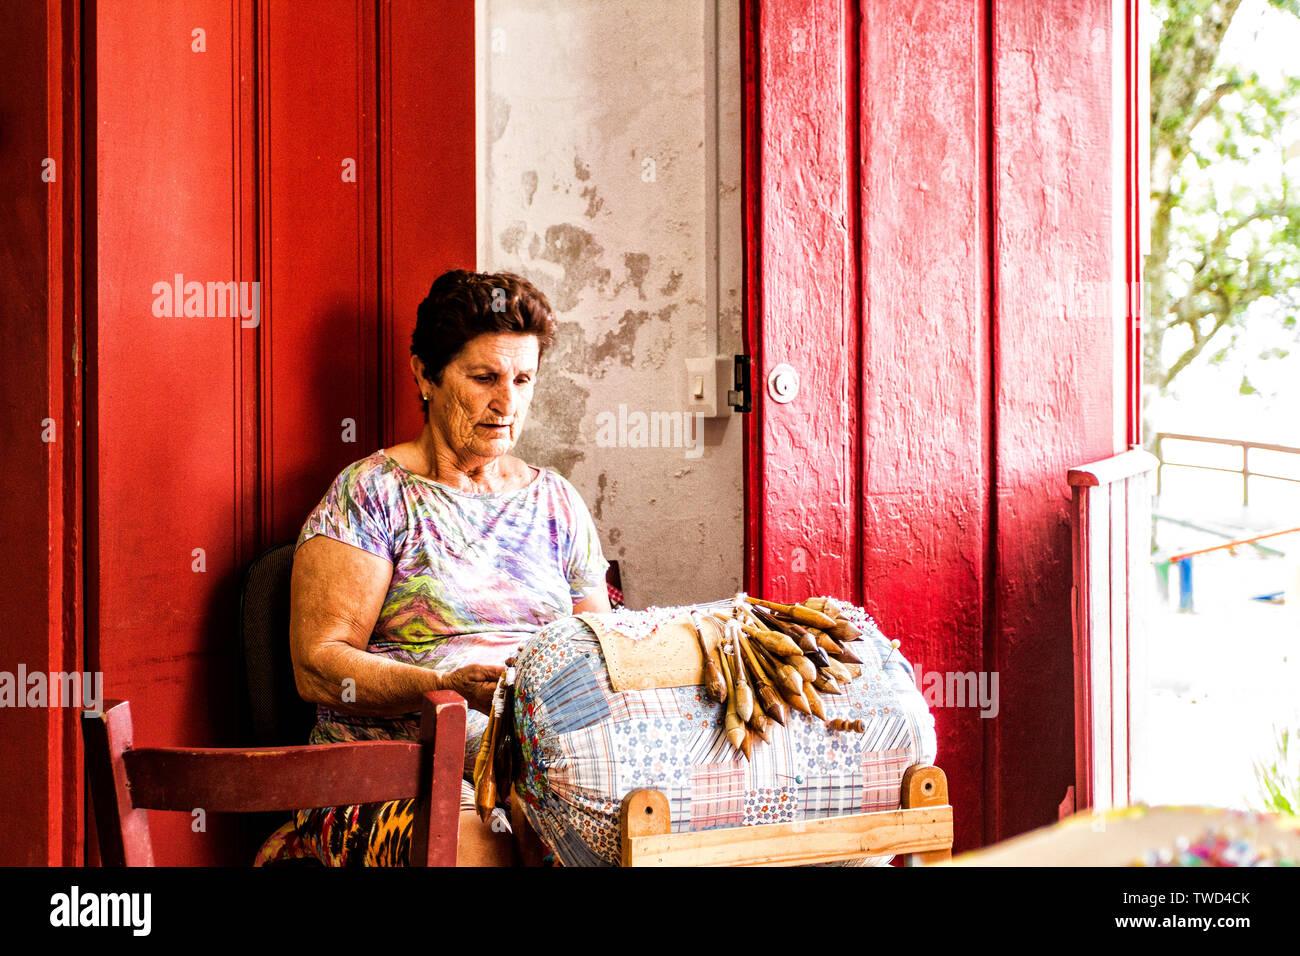 Artisan woman doing bobbin lace work in Sambaqui, at Santo Antonio de Lisboa district. Florianopolis, Santa Catarina, Brazil. - Stock Image